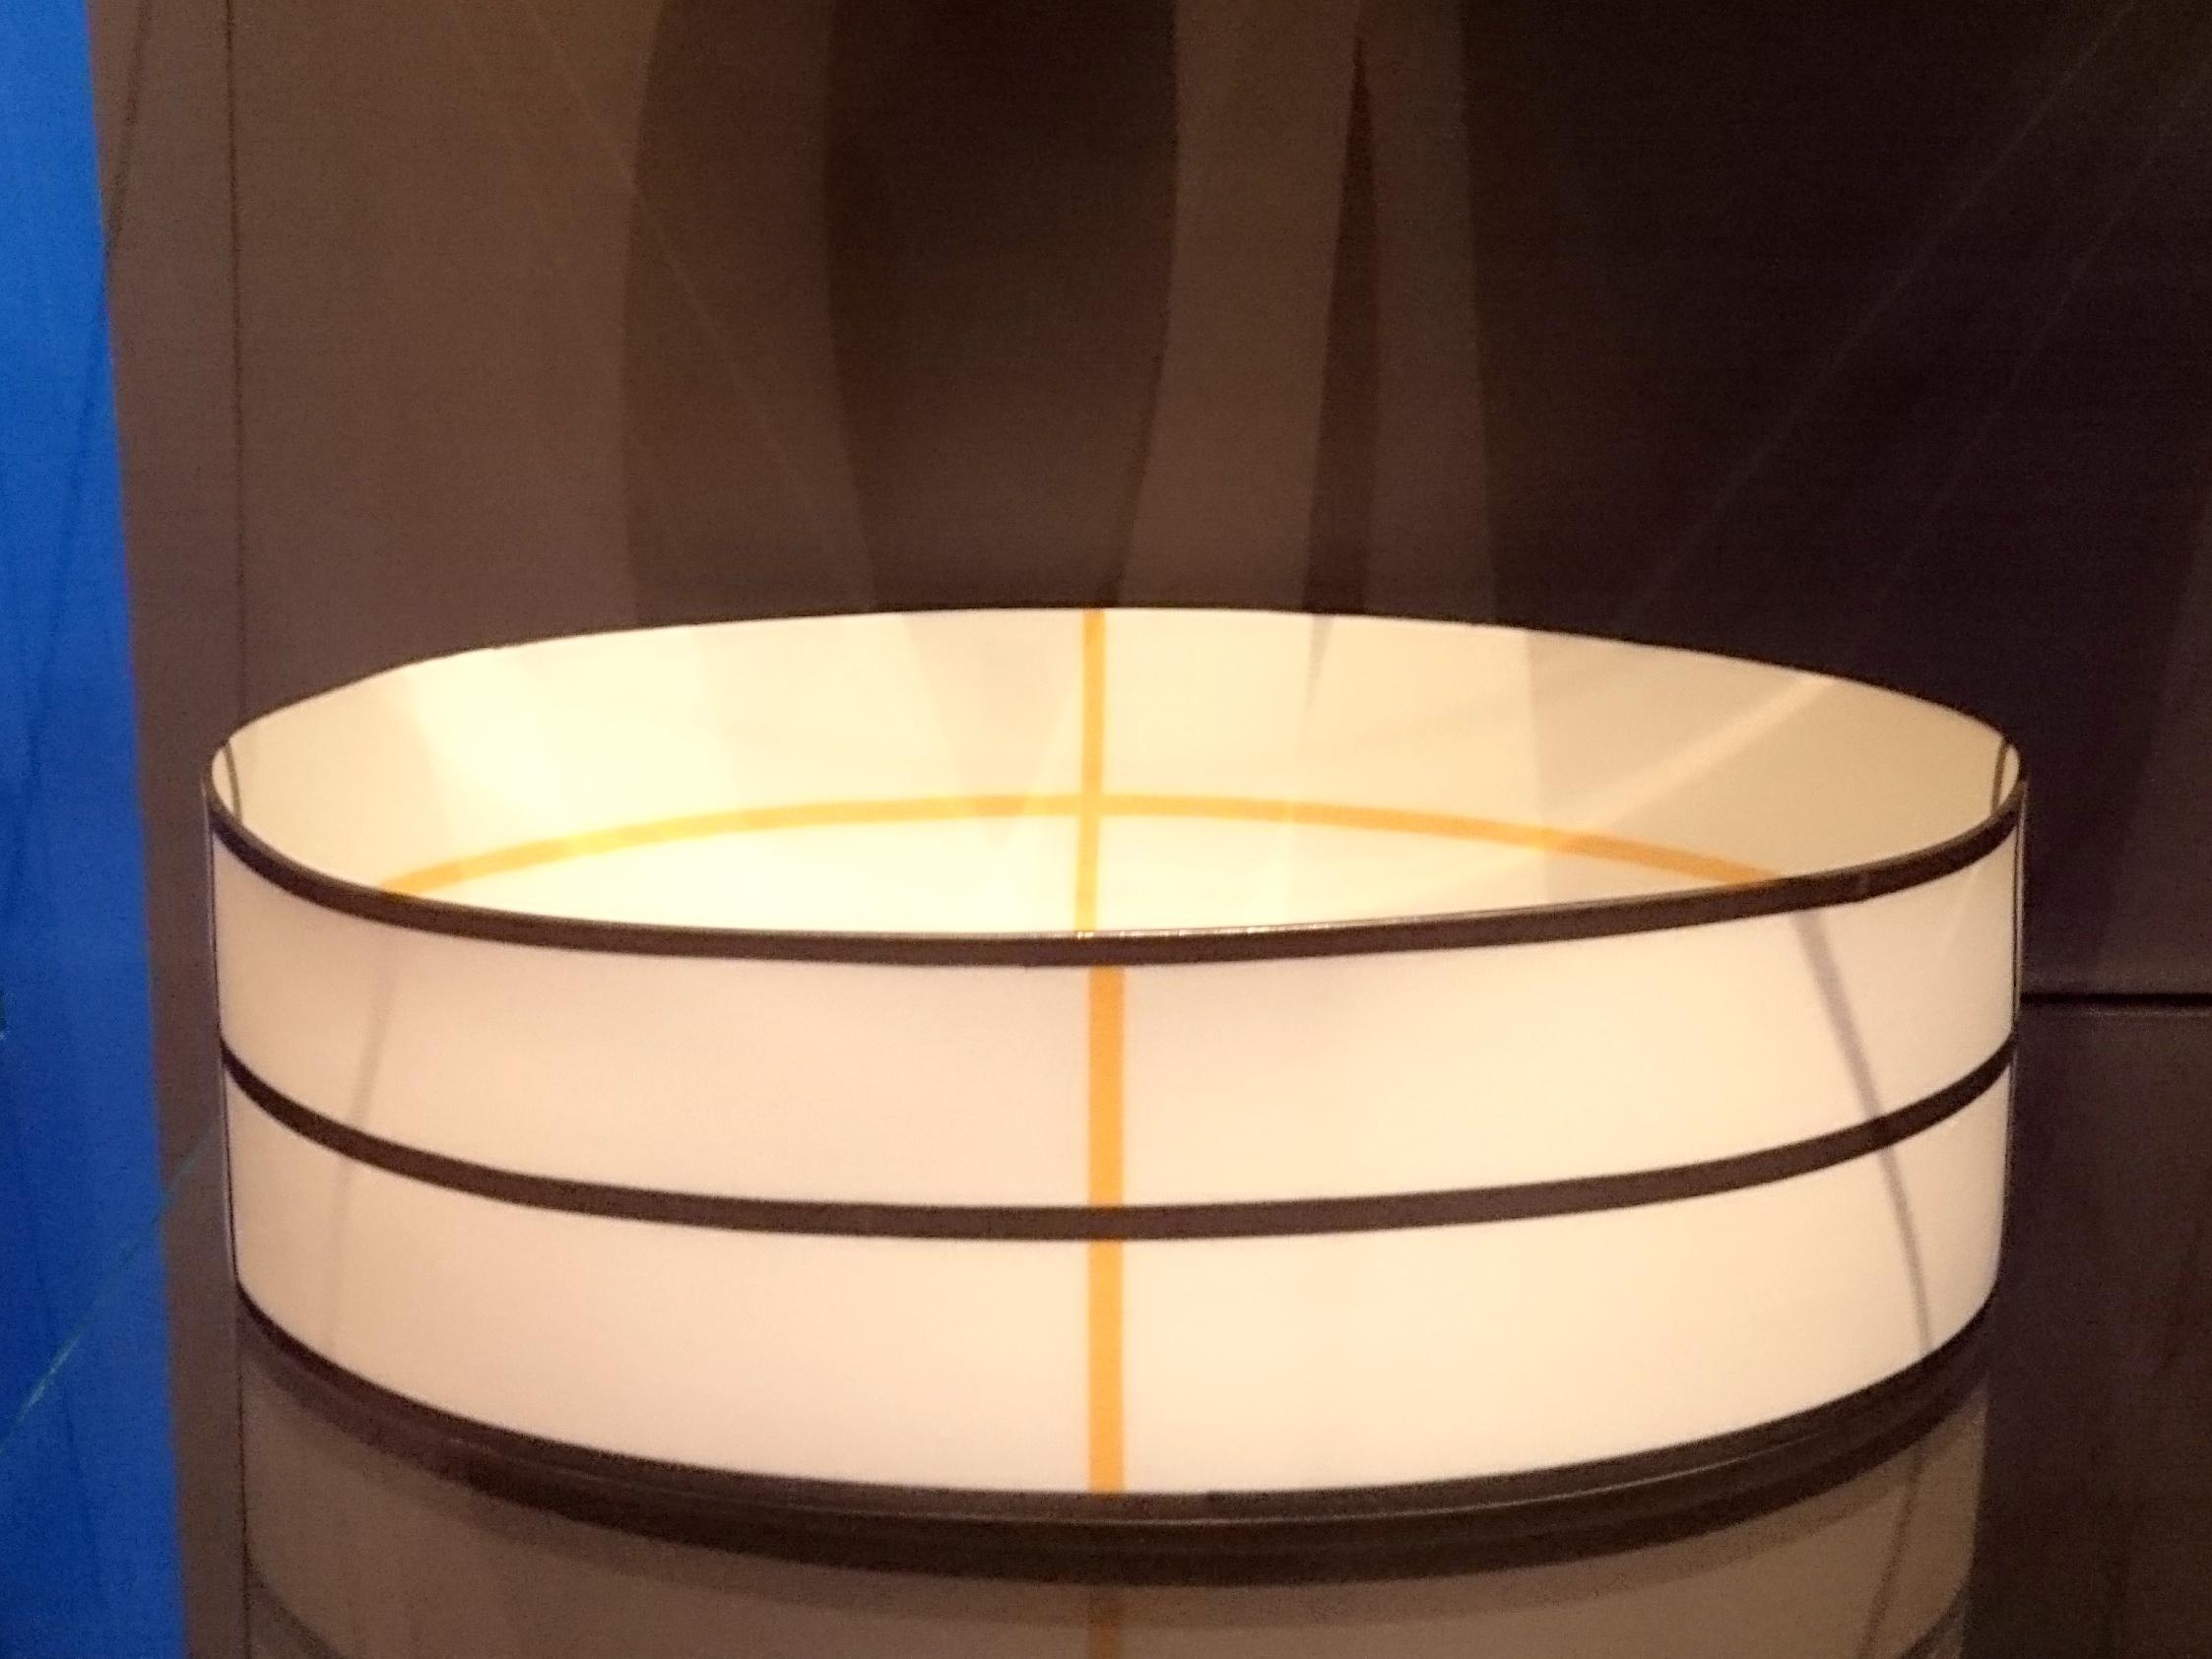 Porcelain oval form by Bodil Menz, 2004